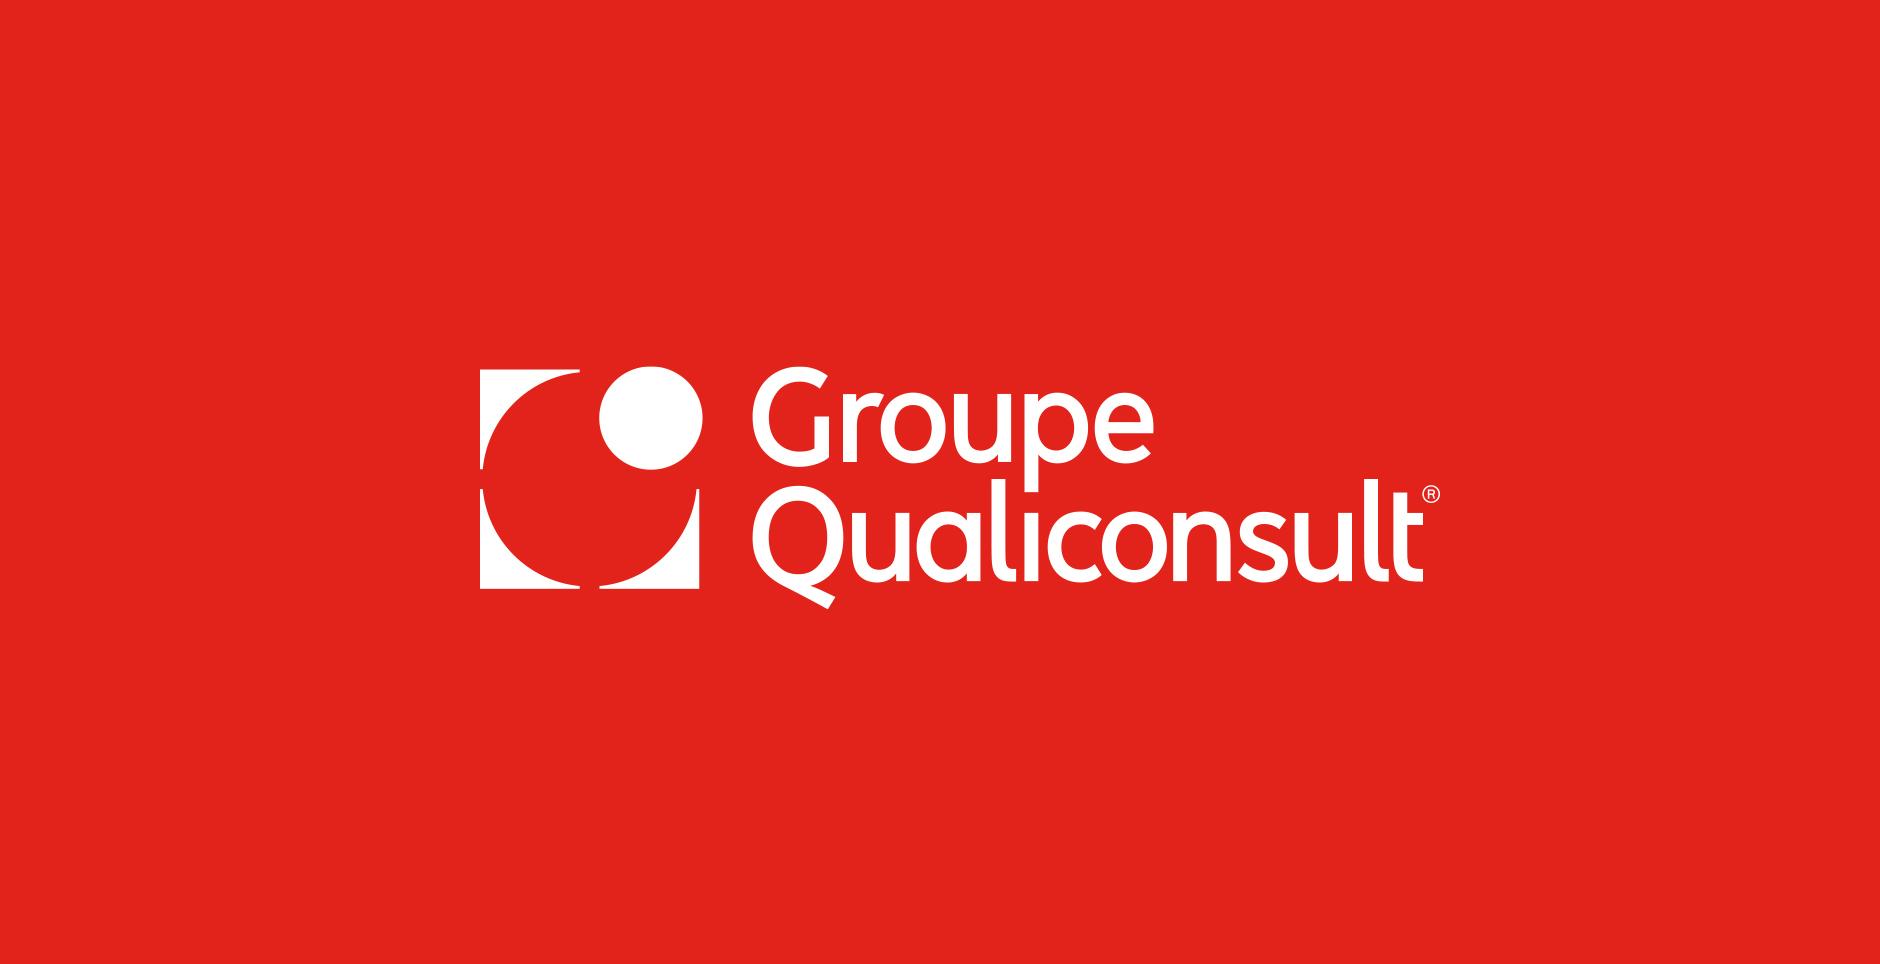 groupe_qualiconsult_rebranding_web-1